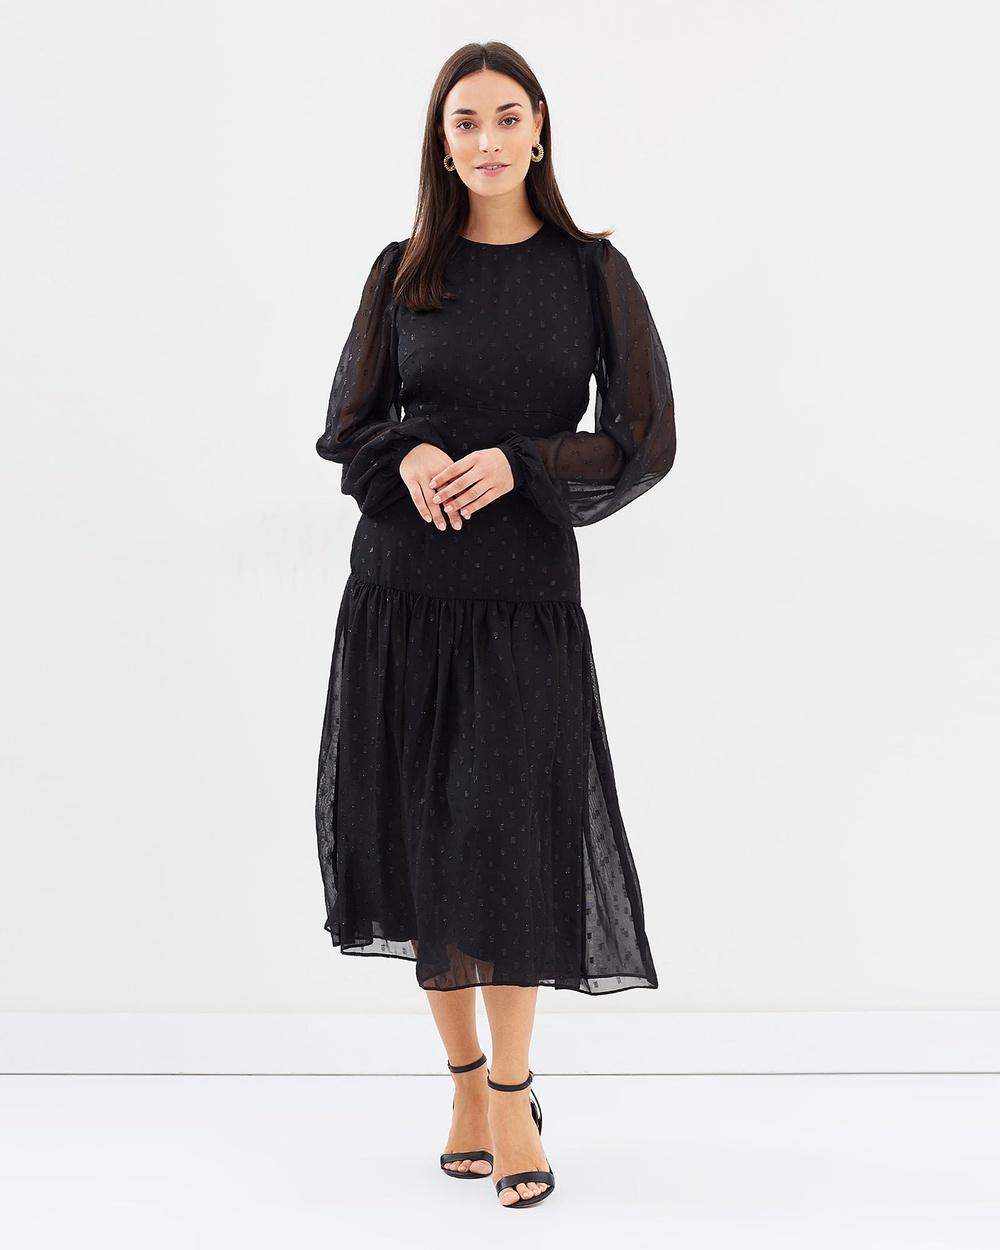 Cooper St Schiffer Long Sleeve Midi Dress Dresses Black Schiffer Long Sleeve Midi Dress